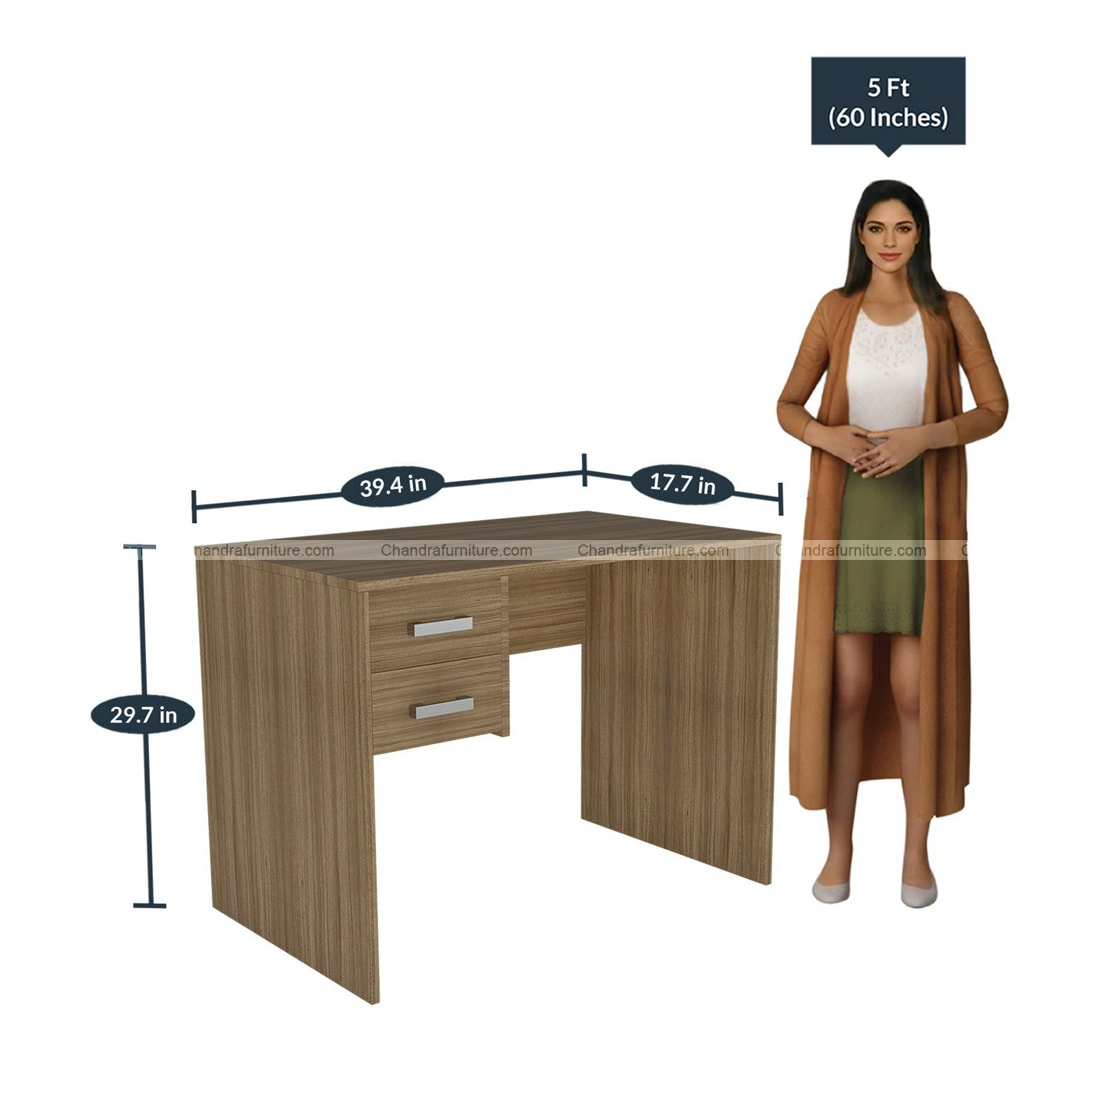 Chandra Furniture Yumi Study Desk In Light Brown Finish